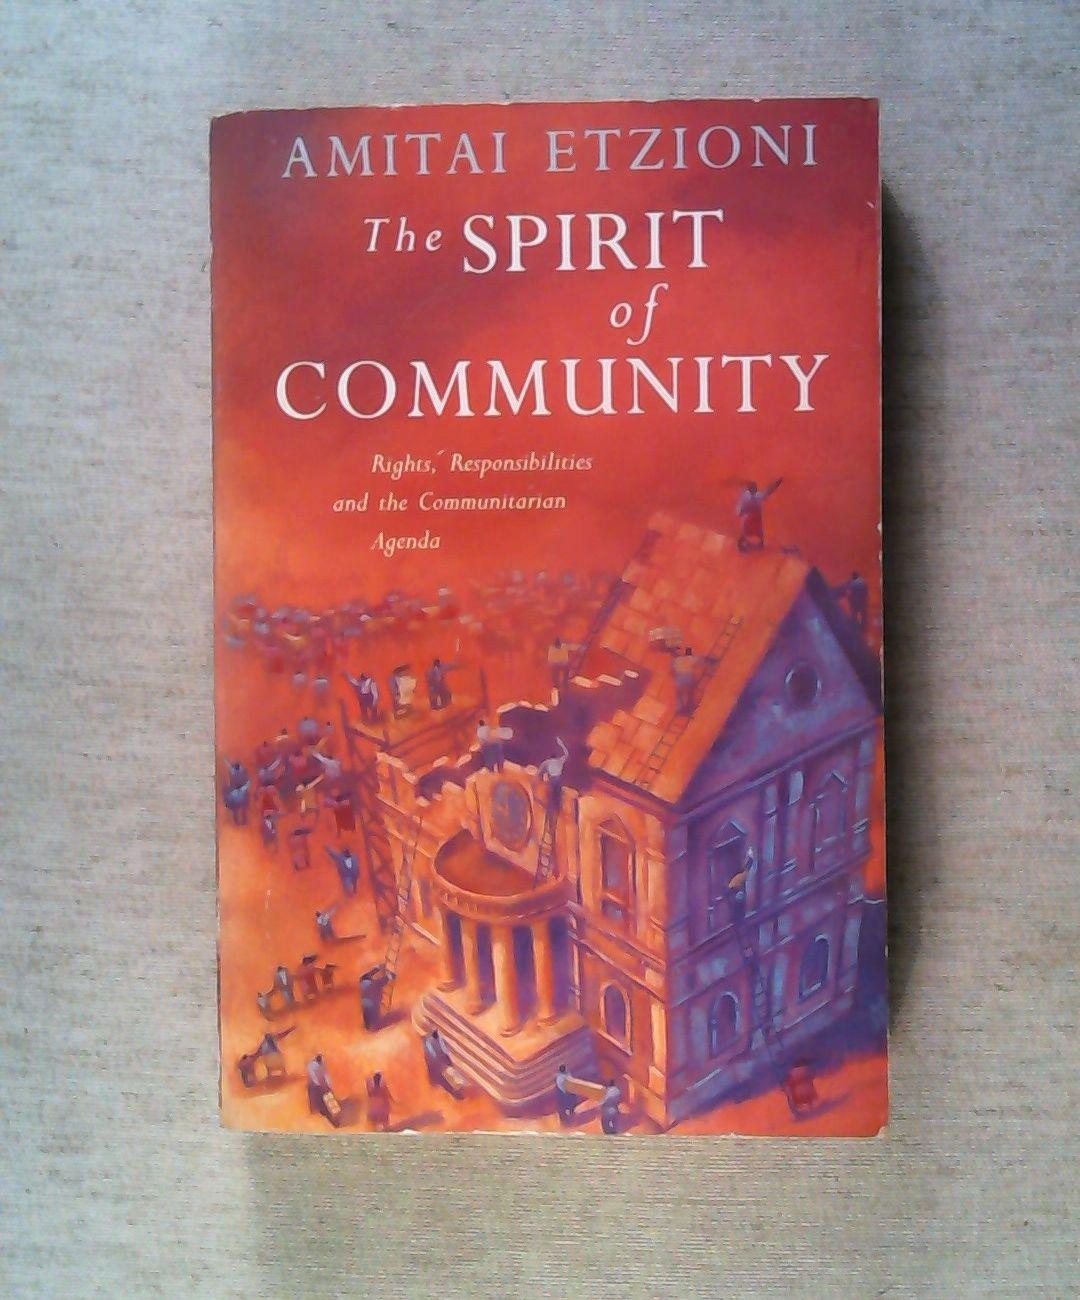 The Spirit of Community: Rights, Responsibilities and: Etzioni, Amitai: